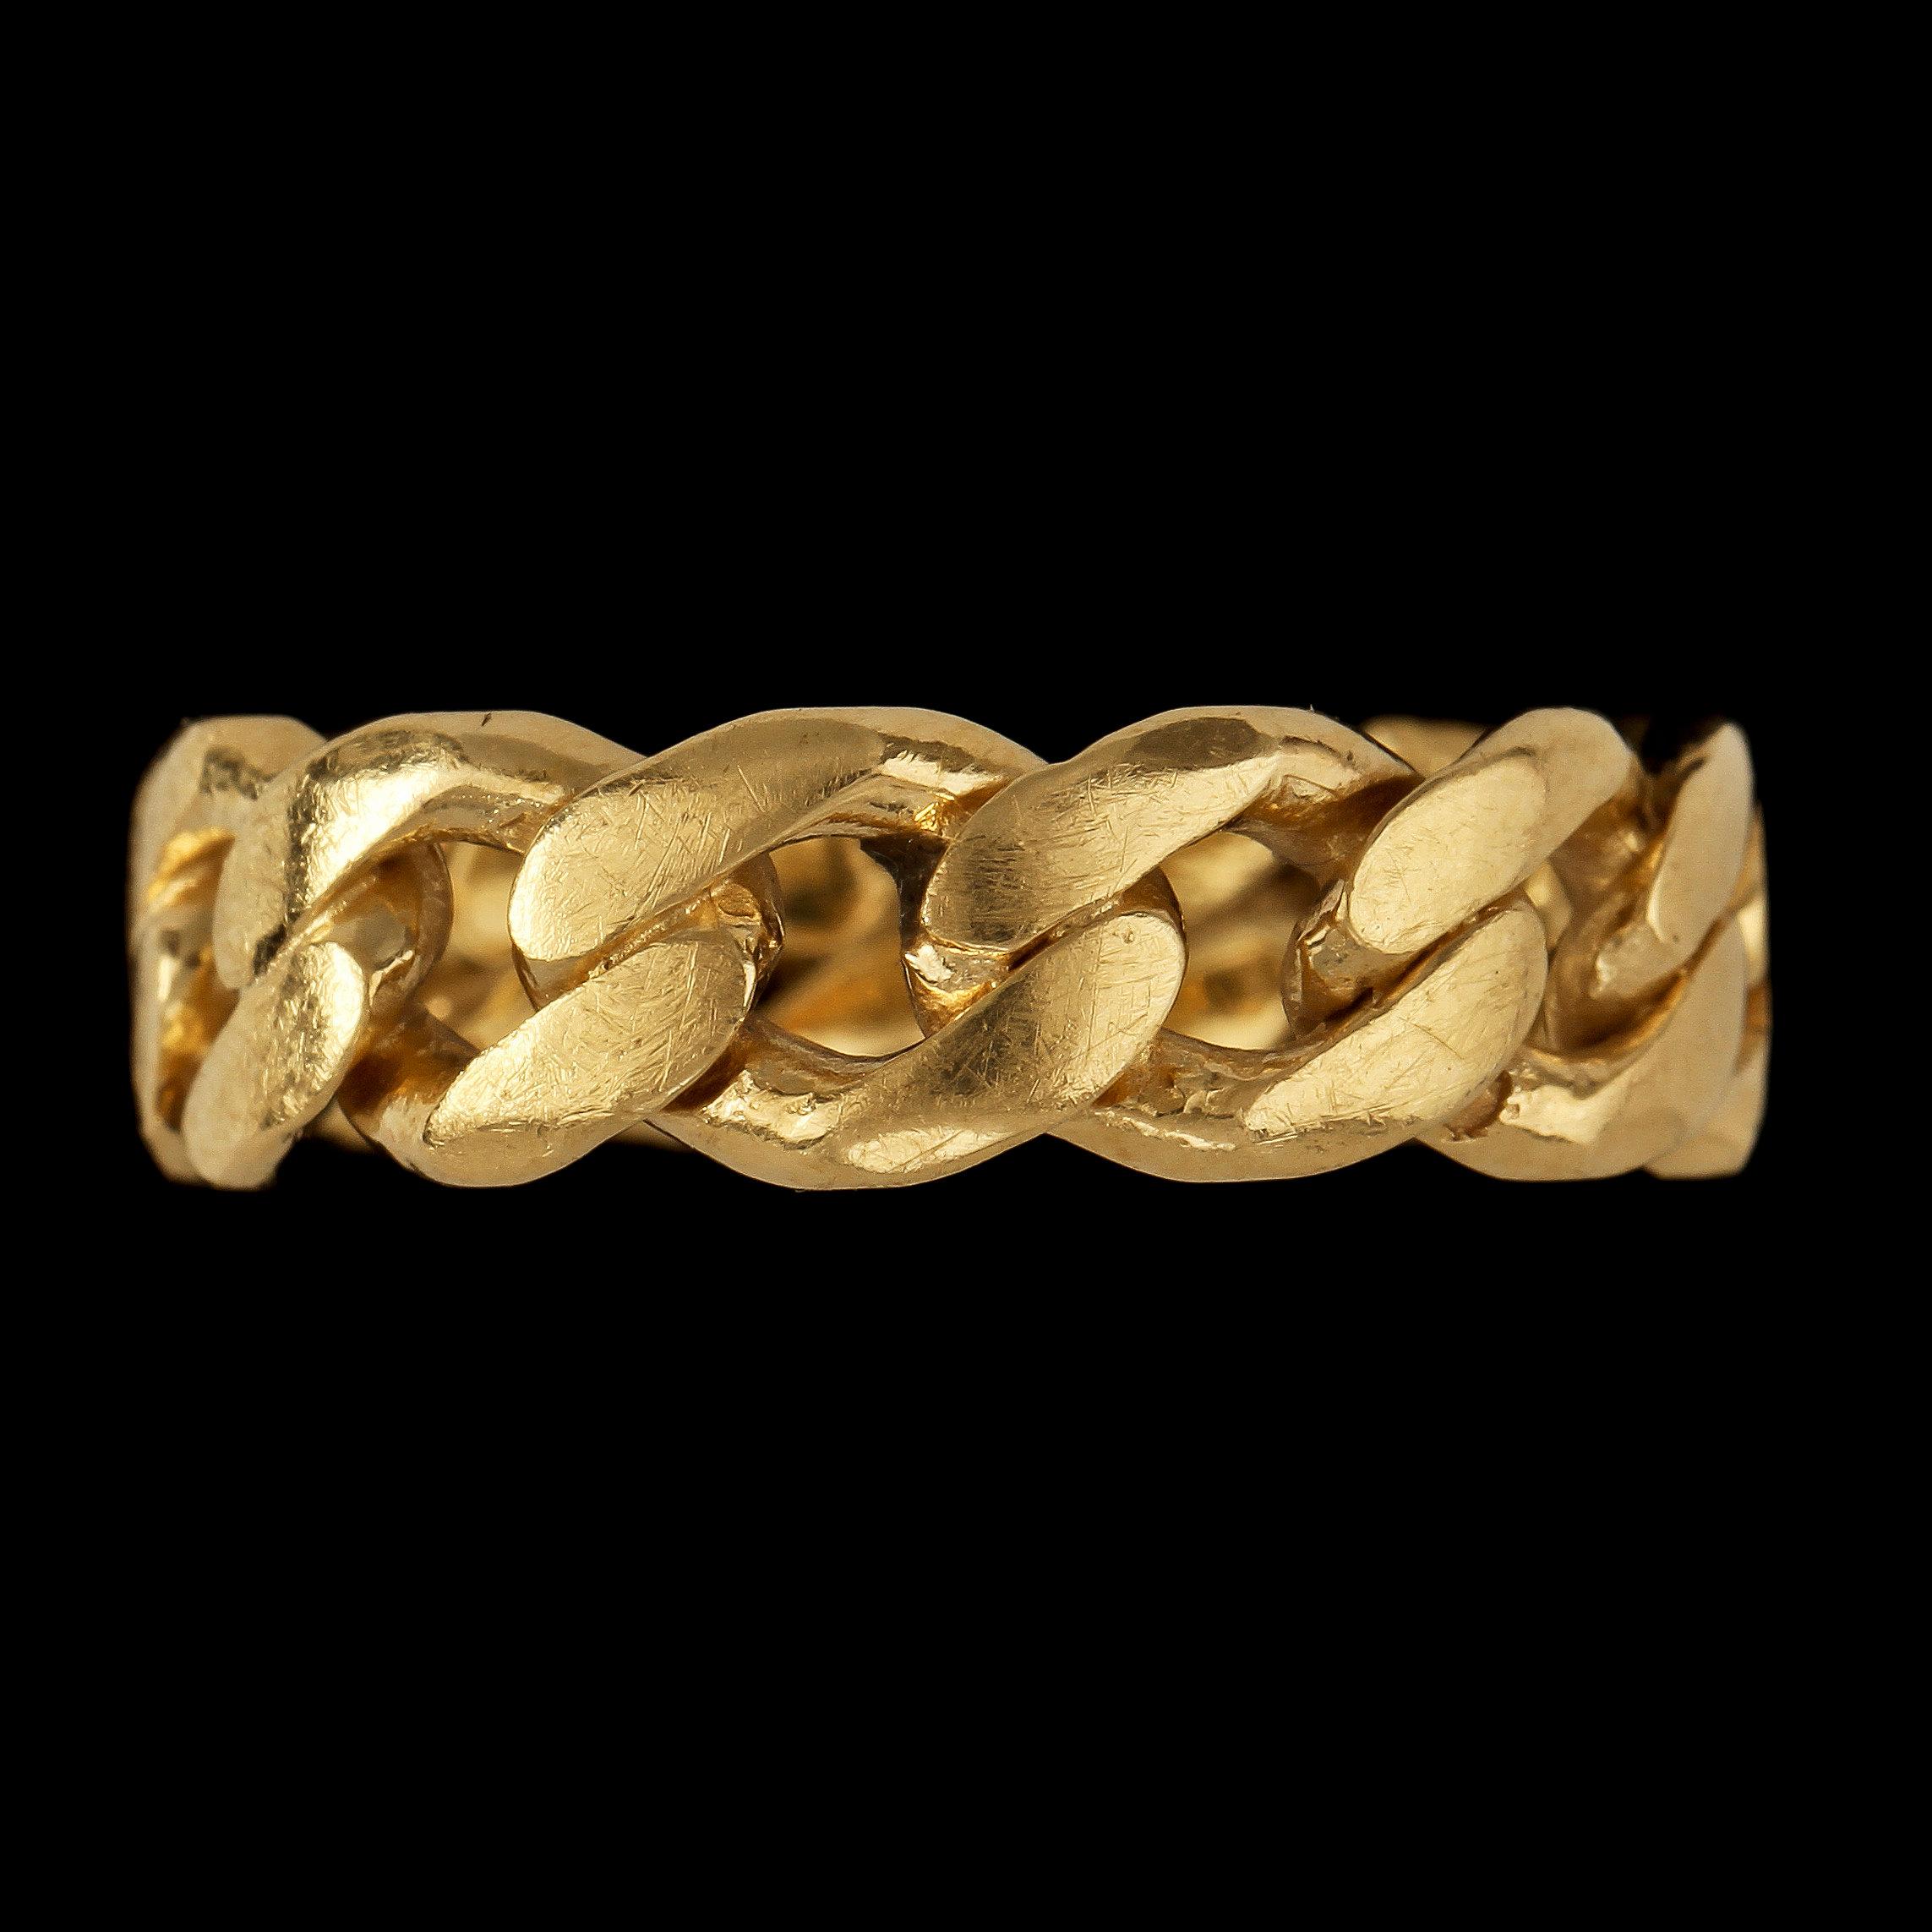 7c8aa7c6011f RING, 18k guld, GHA, Guldfynd, Hallbergs Guld och Albrekts Guld, 1900-tal.  Vikt 8 g. - Bukowskis